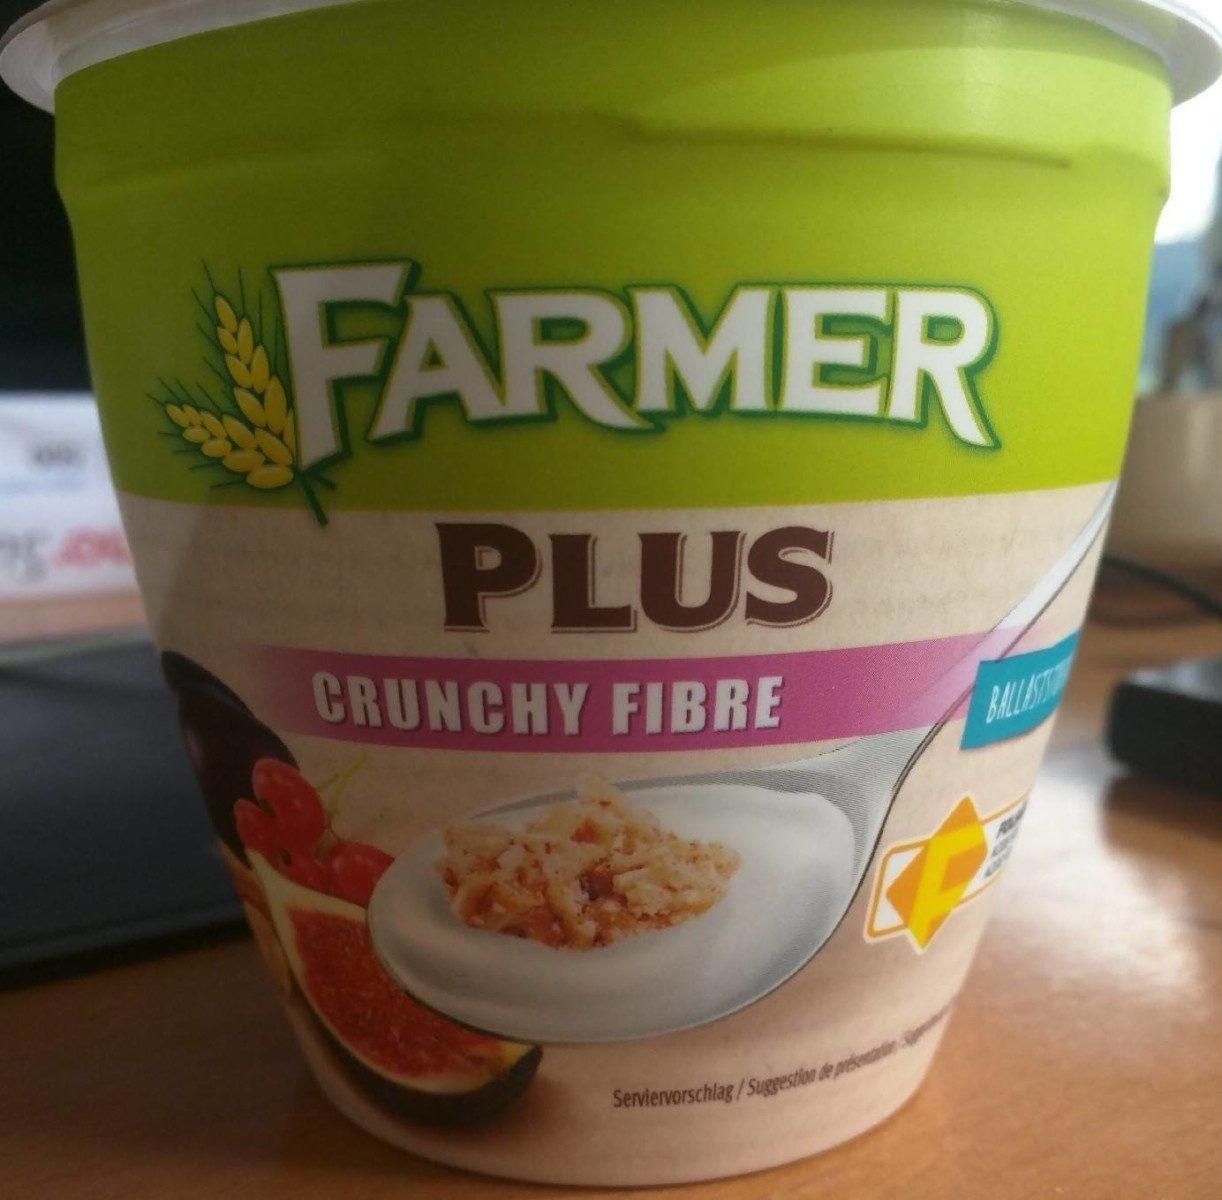 Farmer Plus Crunchy Fibre - Product